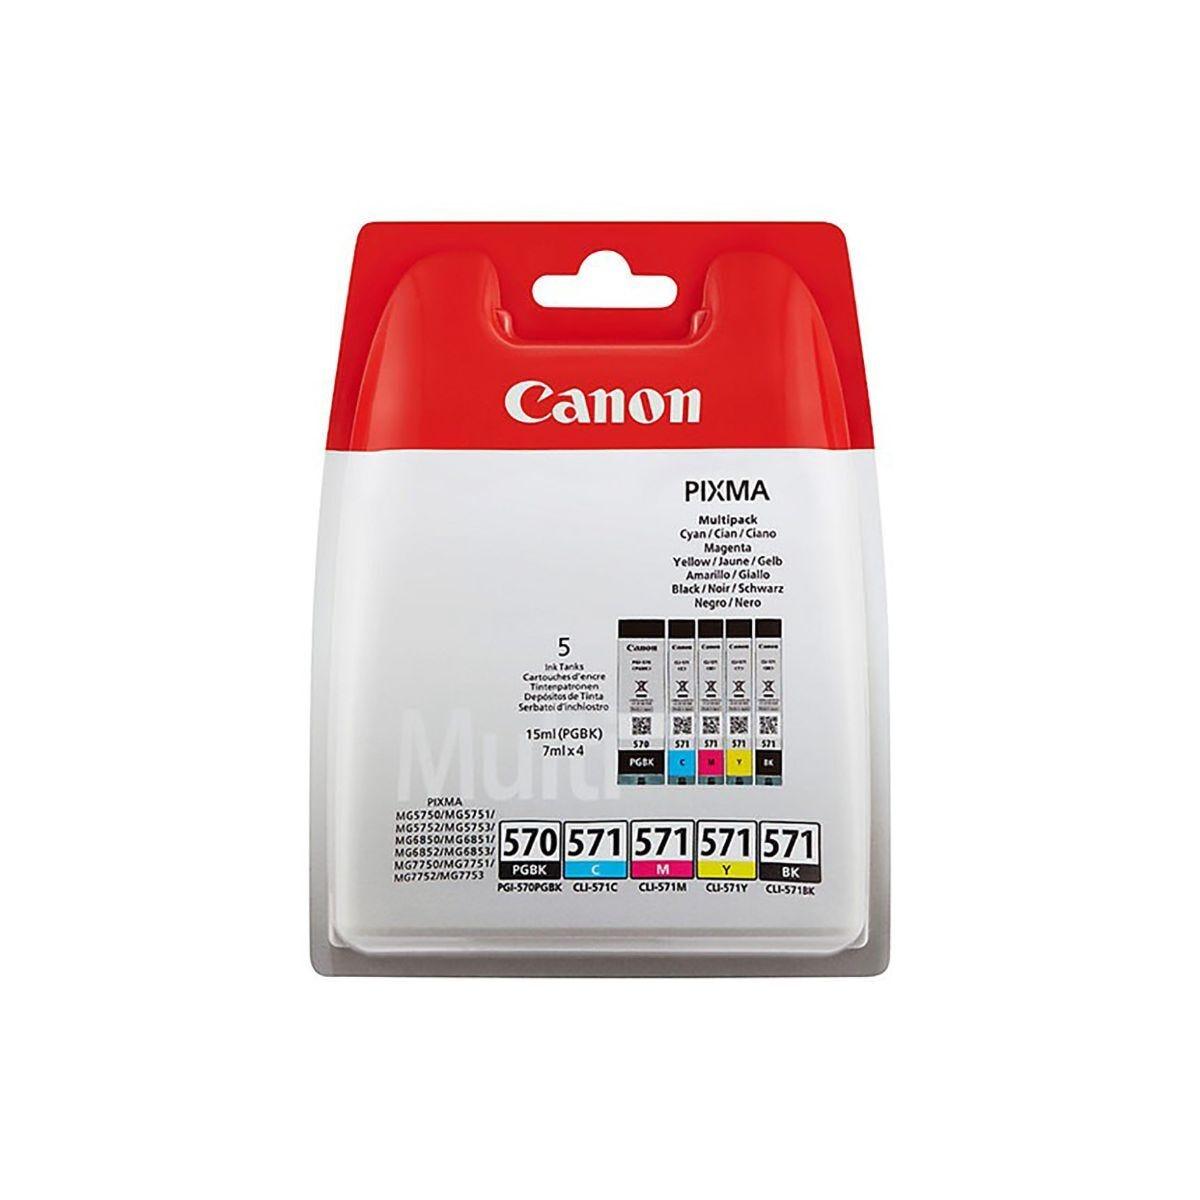 Canon PGI-570 Value Pack Ink Cartridges